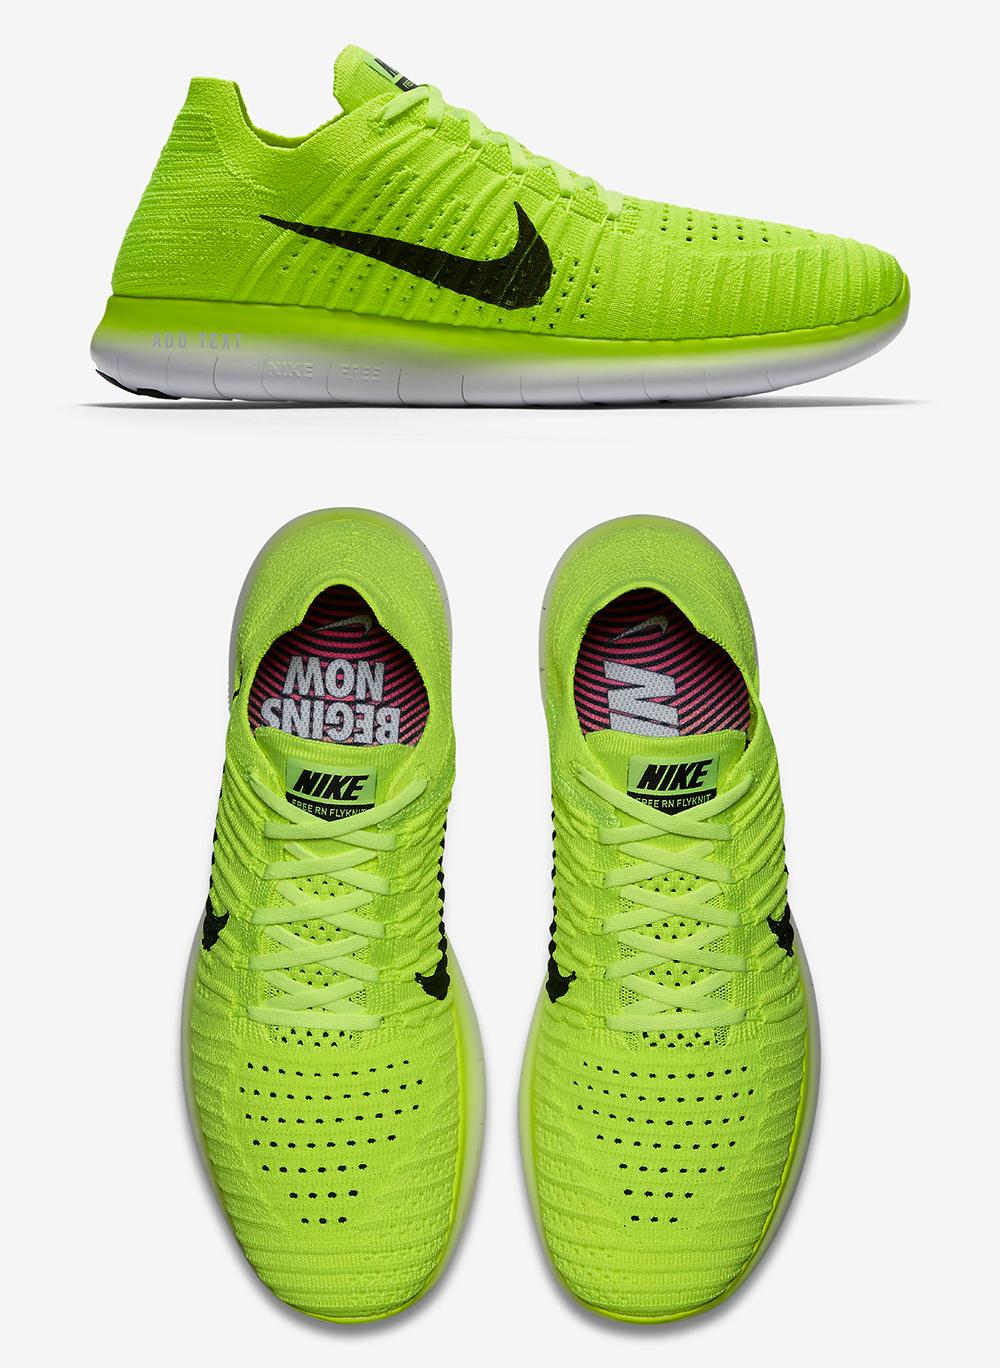 Nike USA podium neon shoes